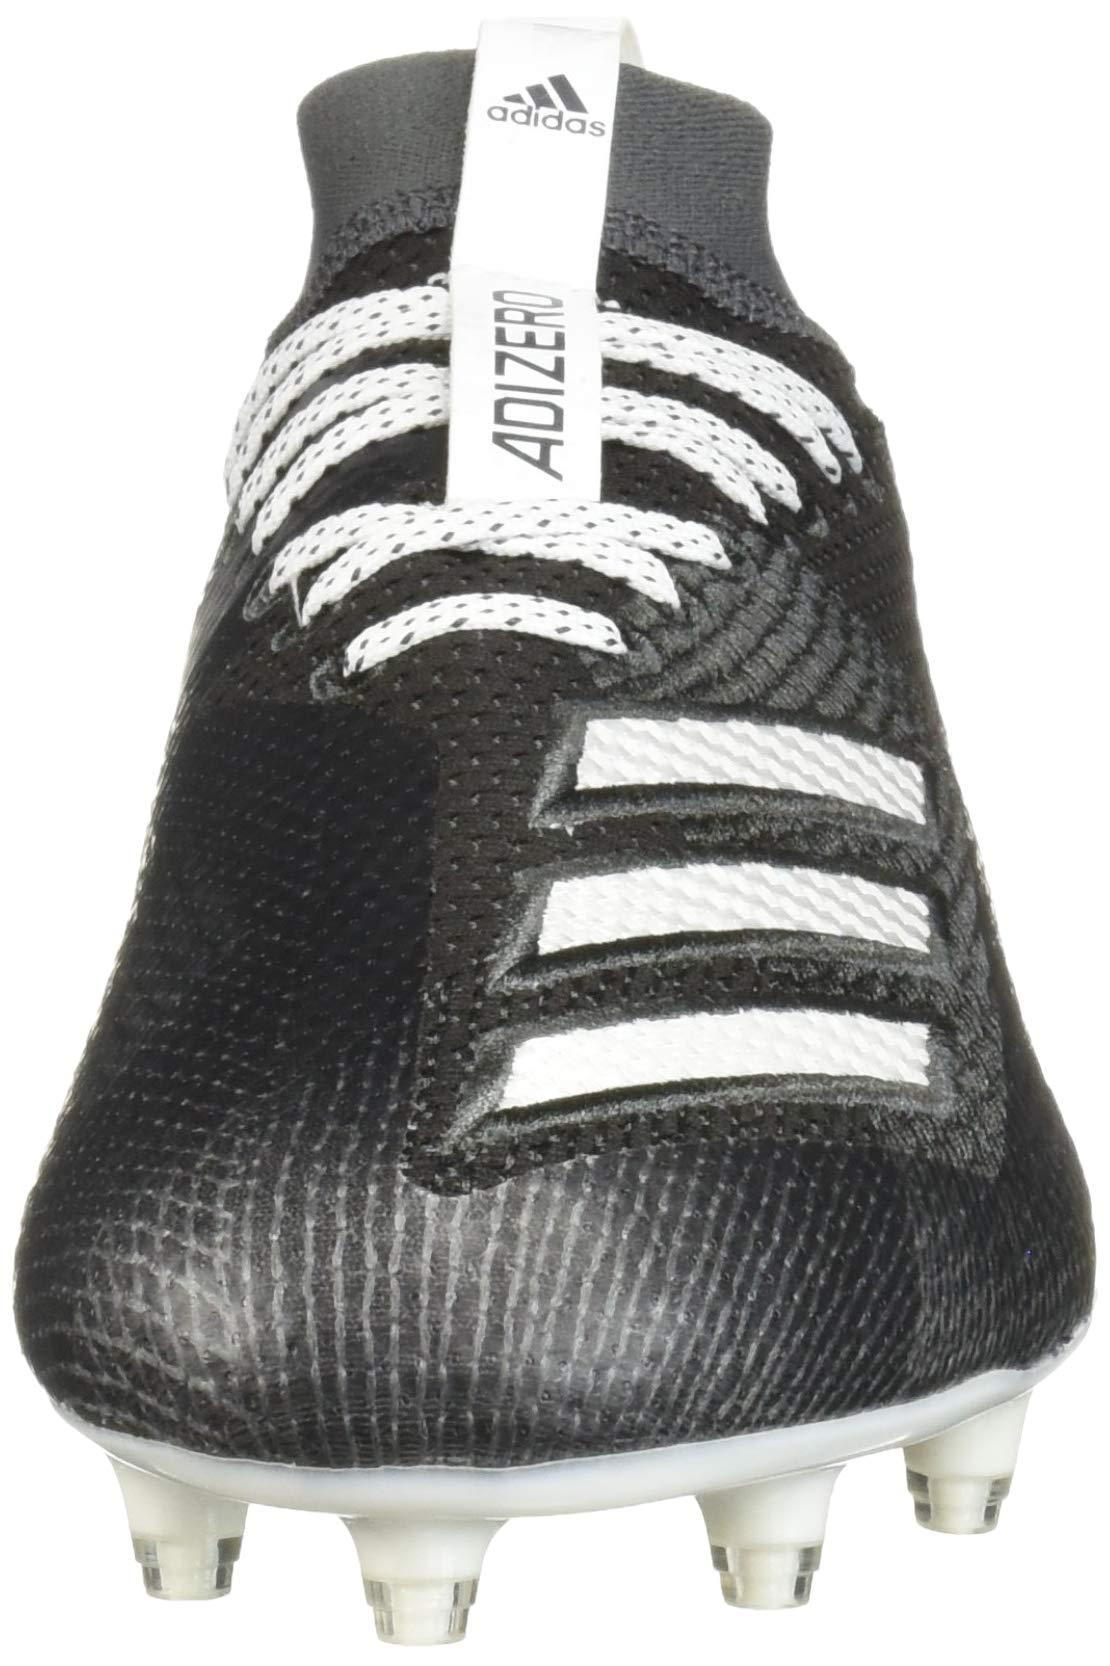 adidas Men's Adizero 8.0 Football Shoe Black/White/Grey 6.5 M US by adidas (Image #4)